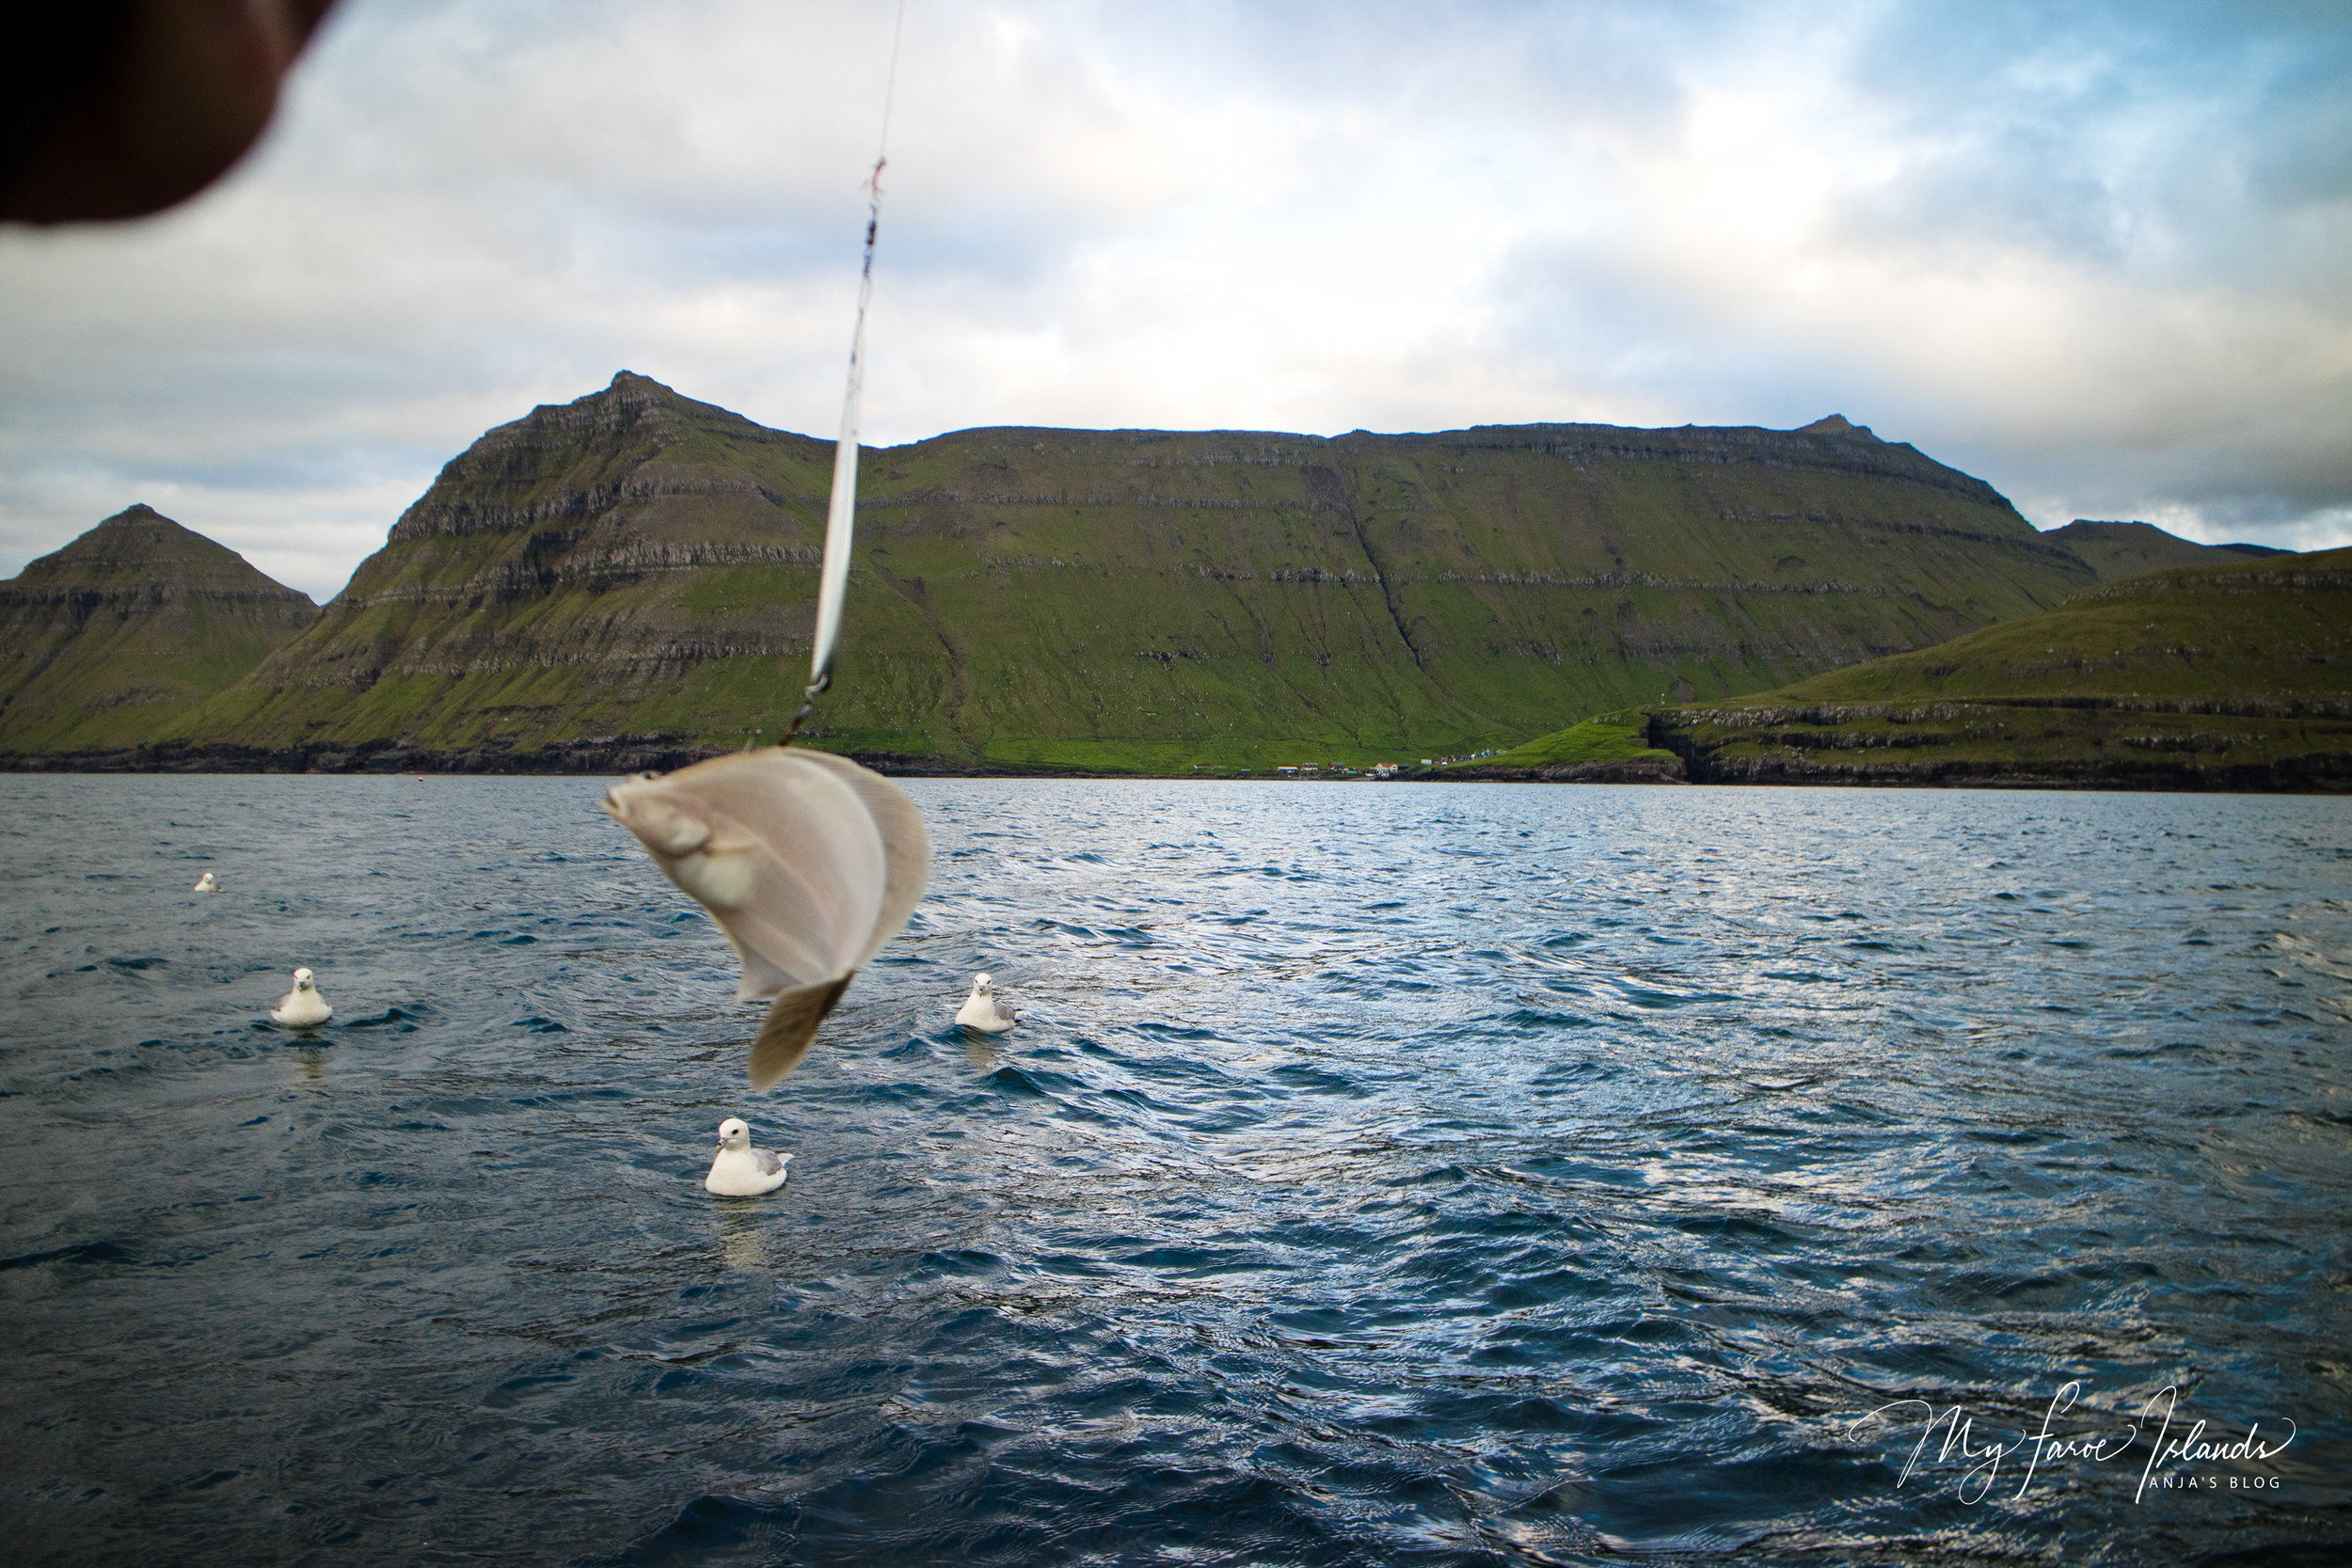 Catch 1 © My Faroe Islands, Anja Mazuhn  (1 von 1).jpg